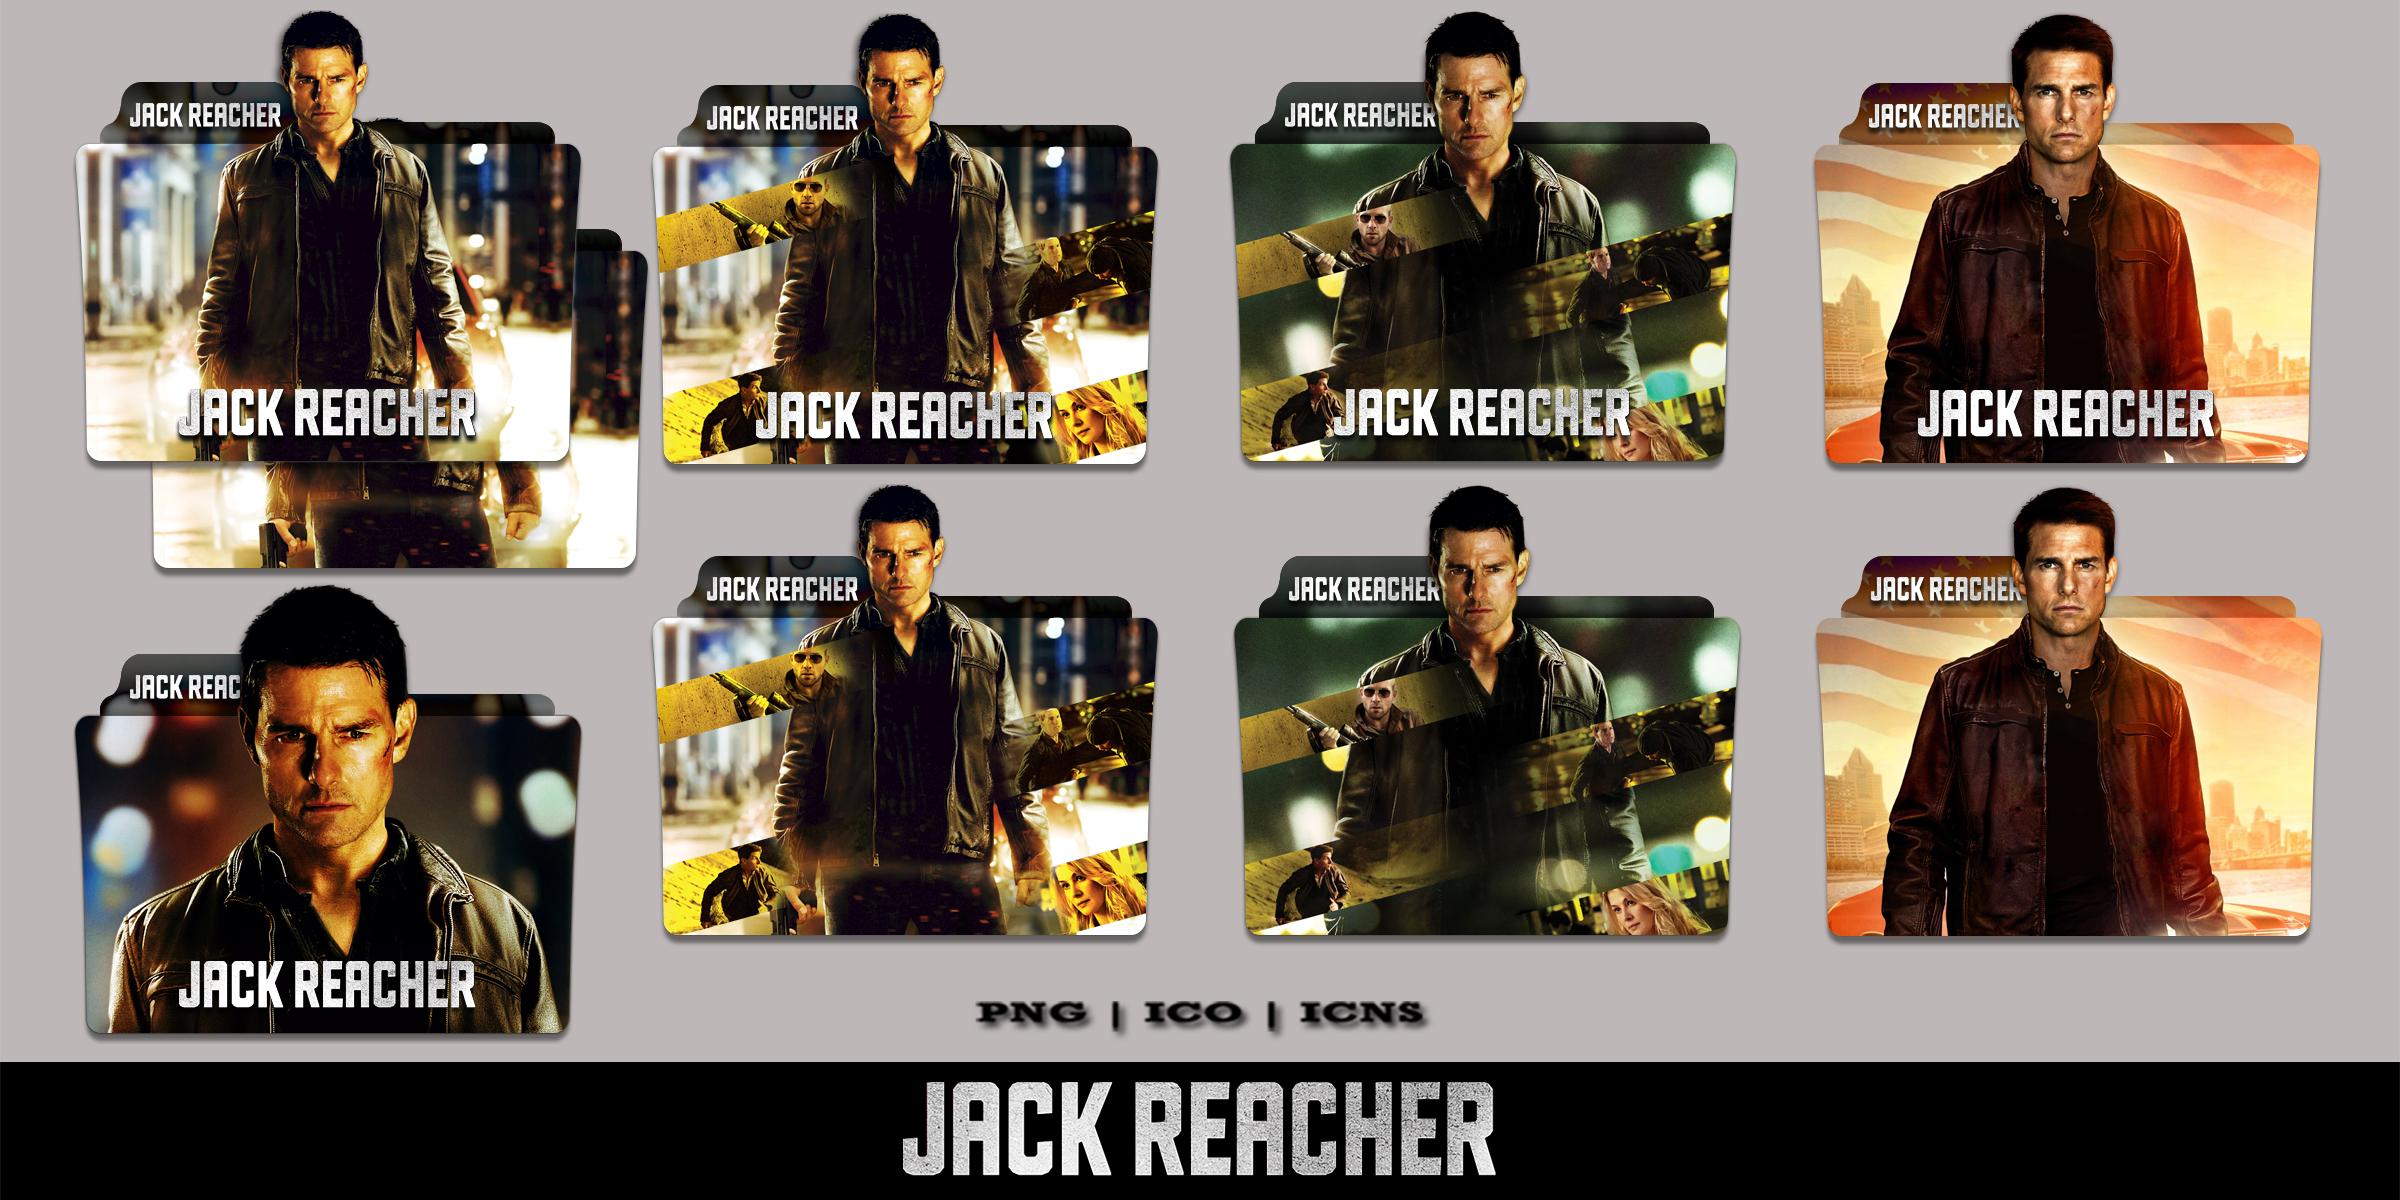 Jack Reacher 2012 Folder Icon Pack By Bl4cksl4yer On Deviantart